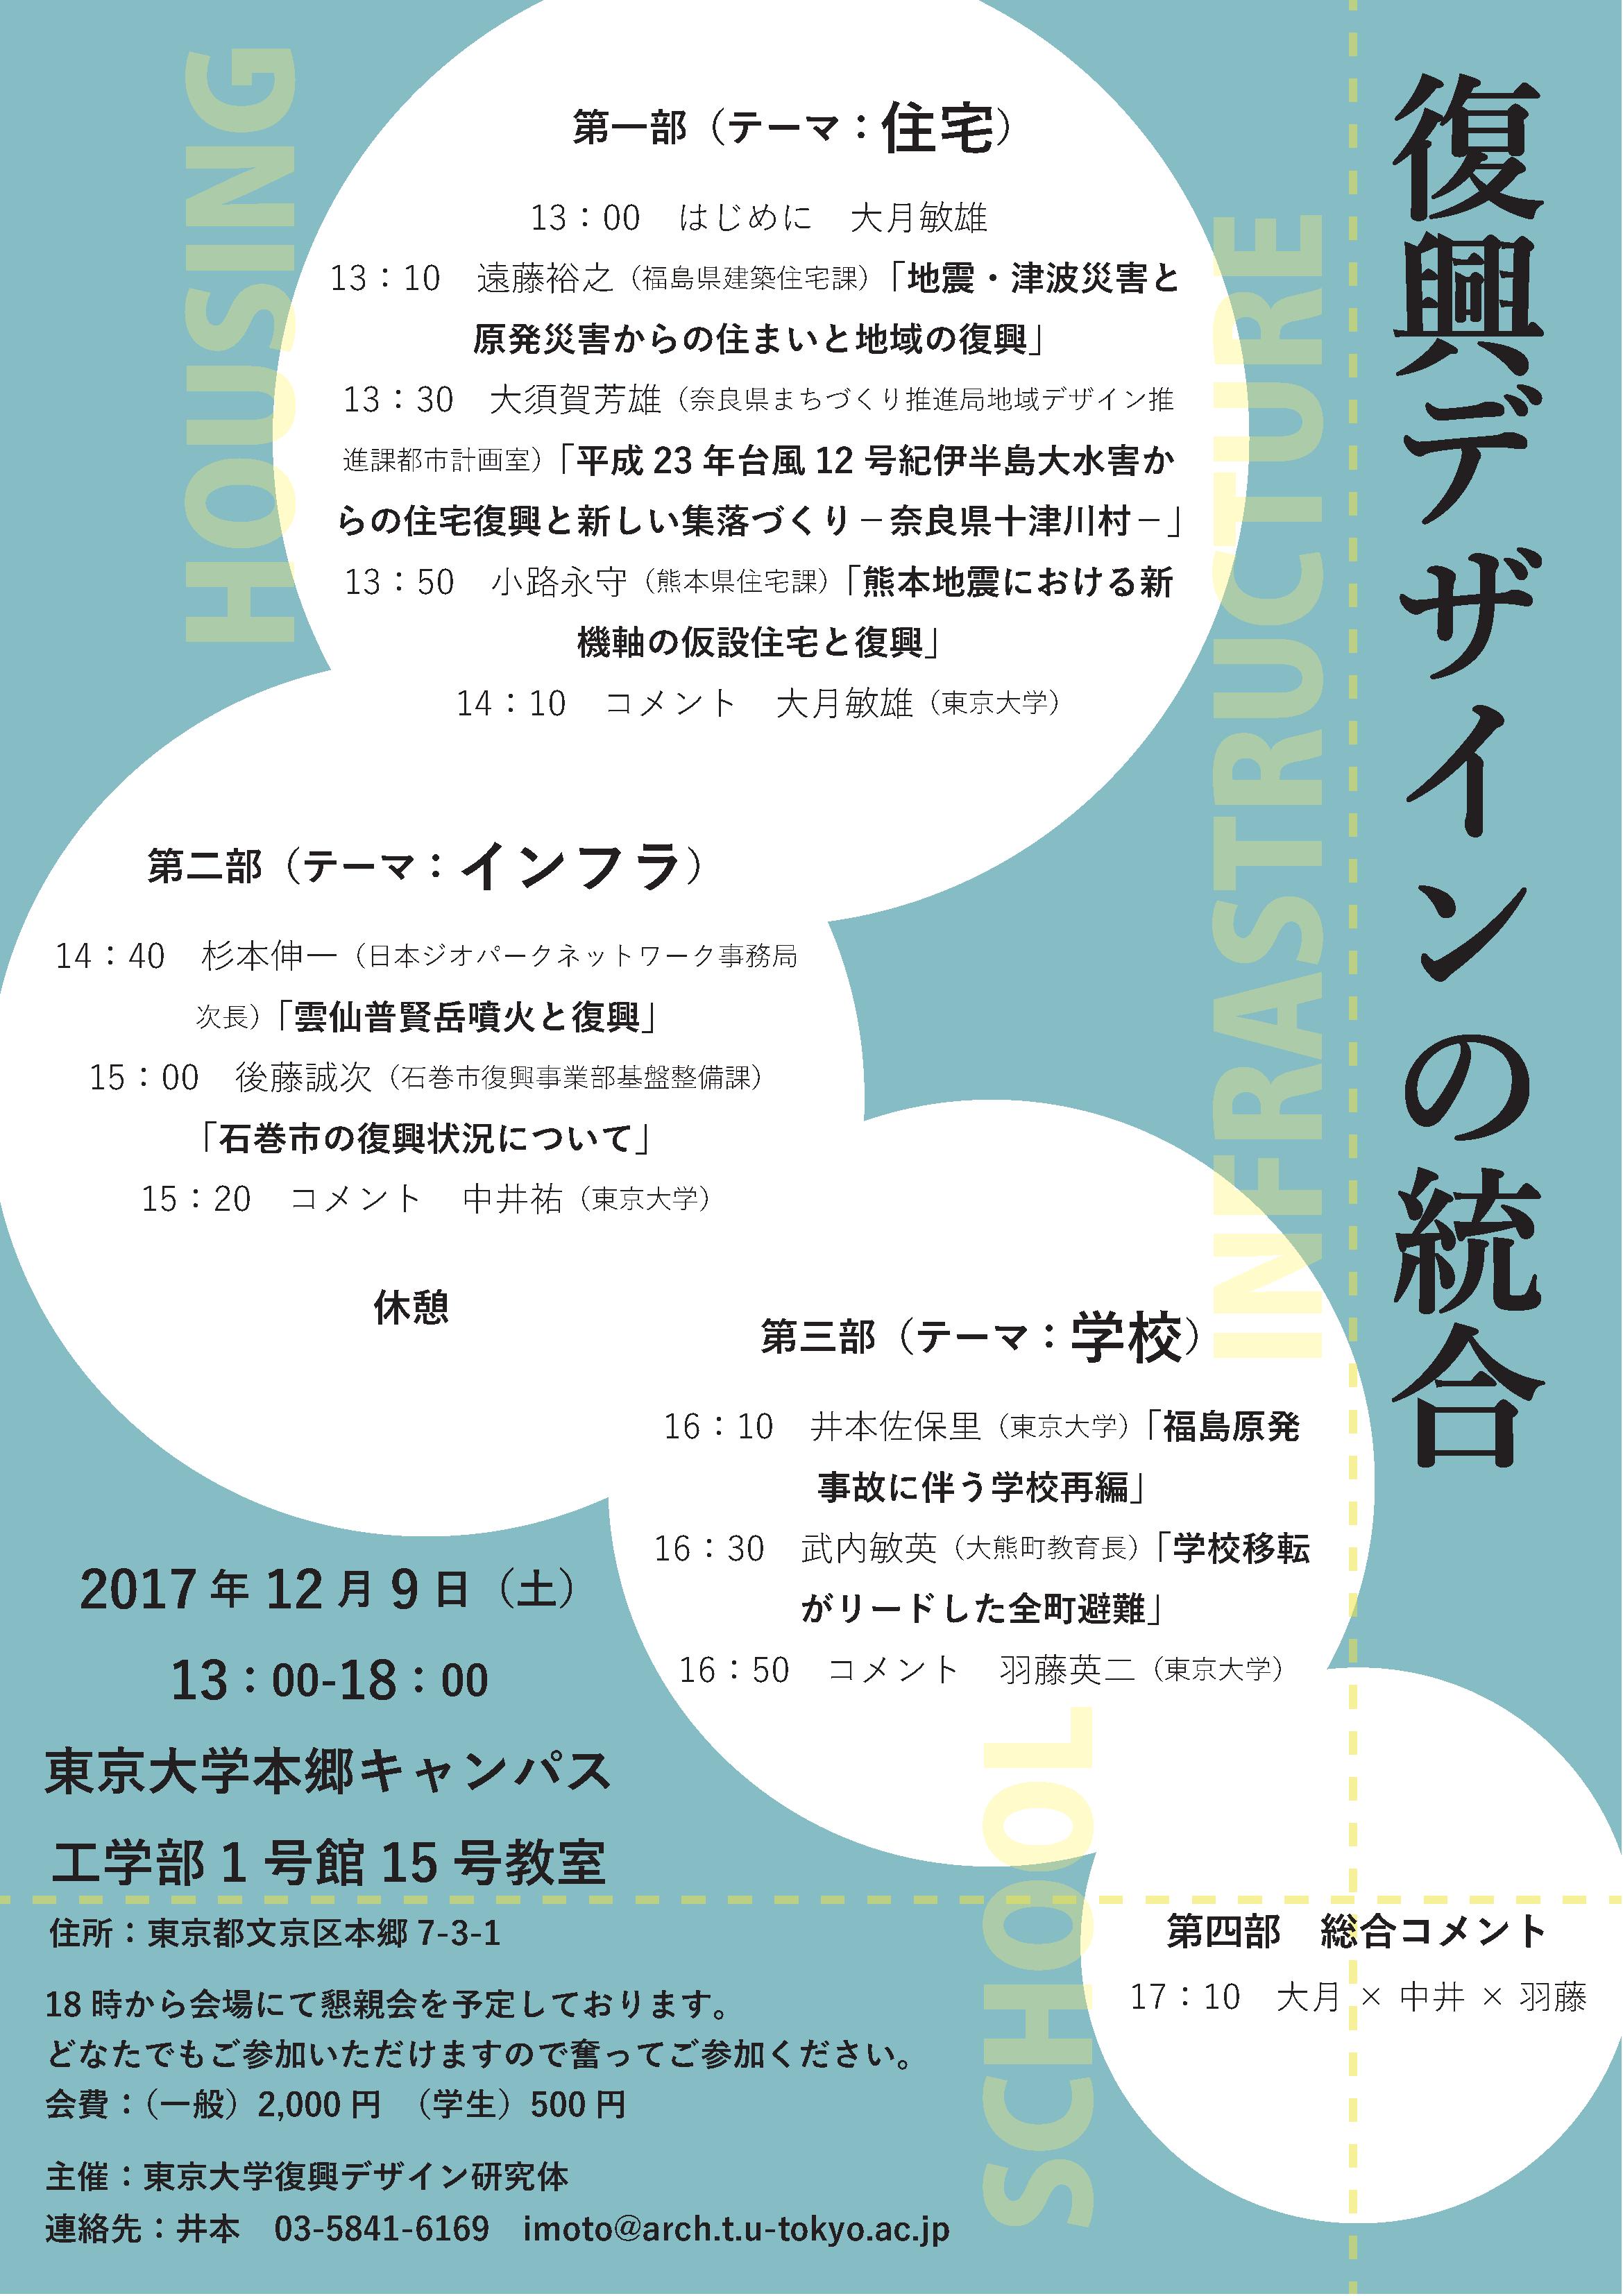 http://bin.t.u-tokyo.ac.jp/dss/img/lecture/forum2017-2/forum2017-2_flyer.png